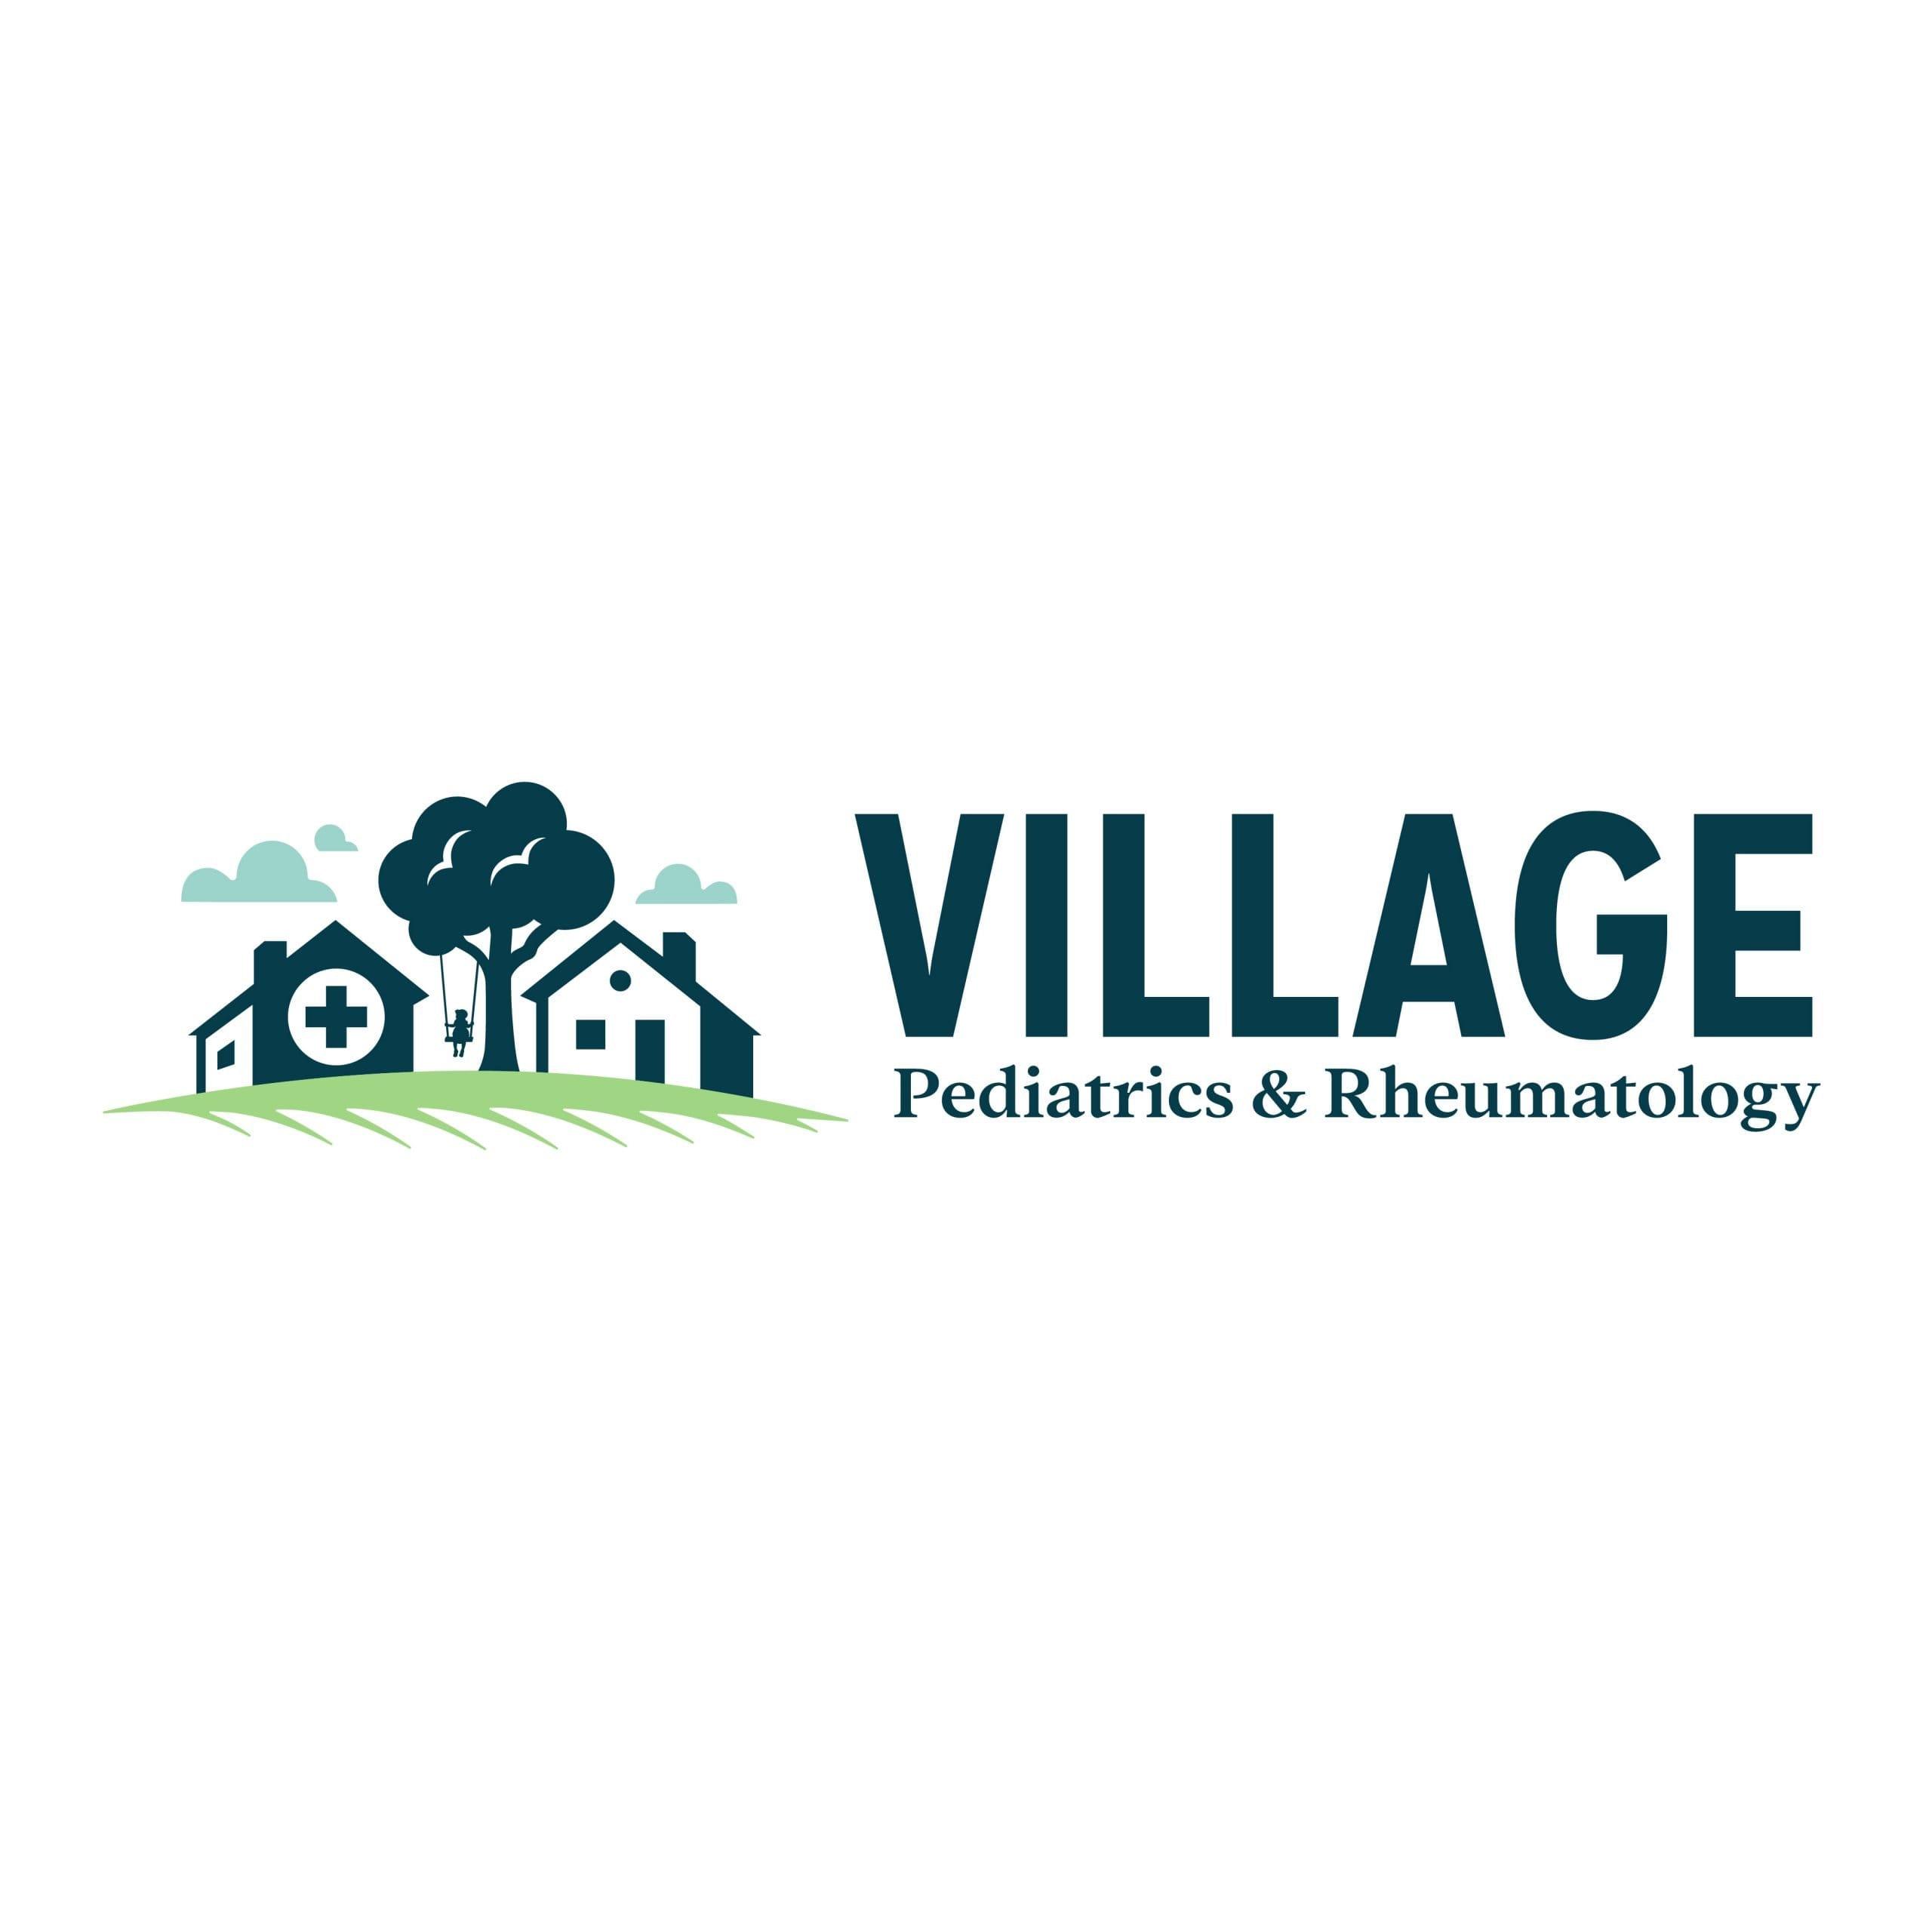 Village Pediatrics & Rheumatology Logo Design